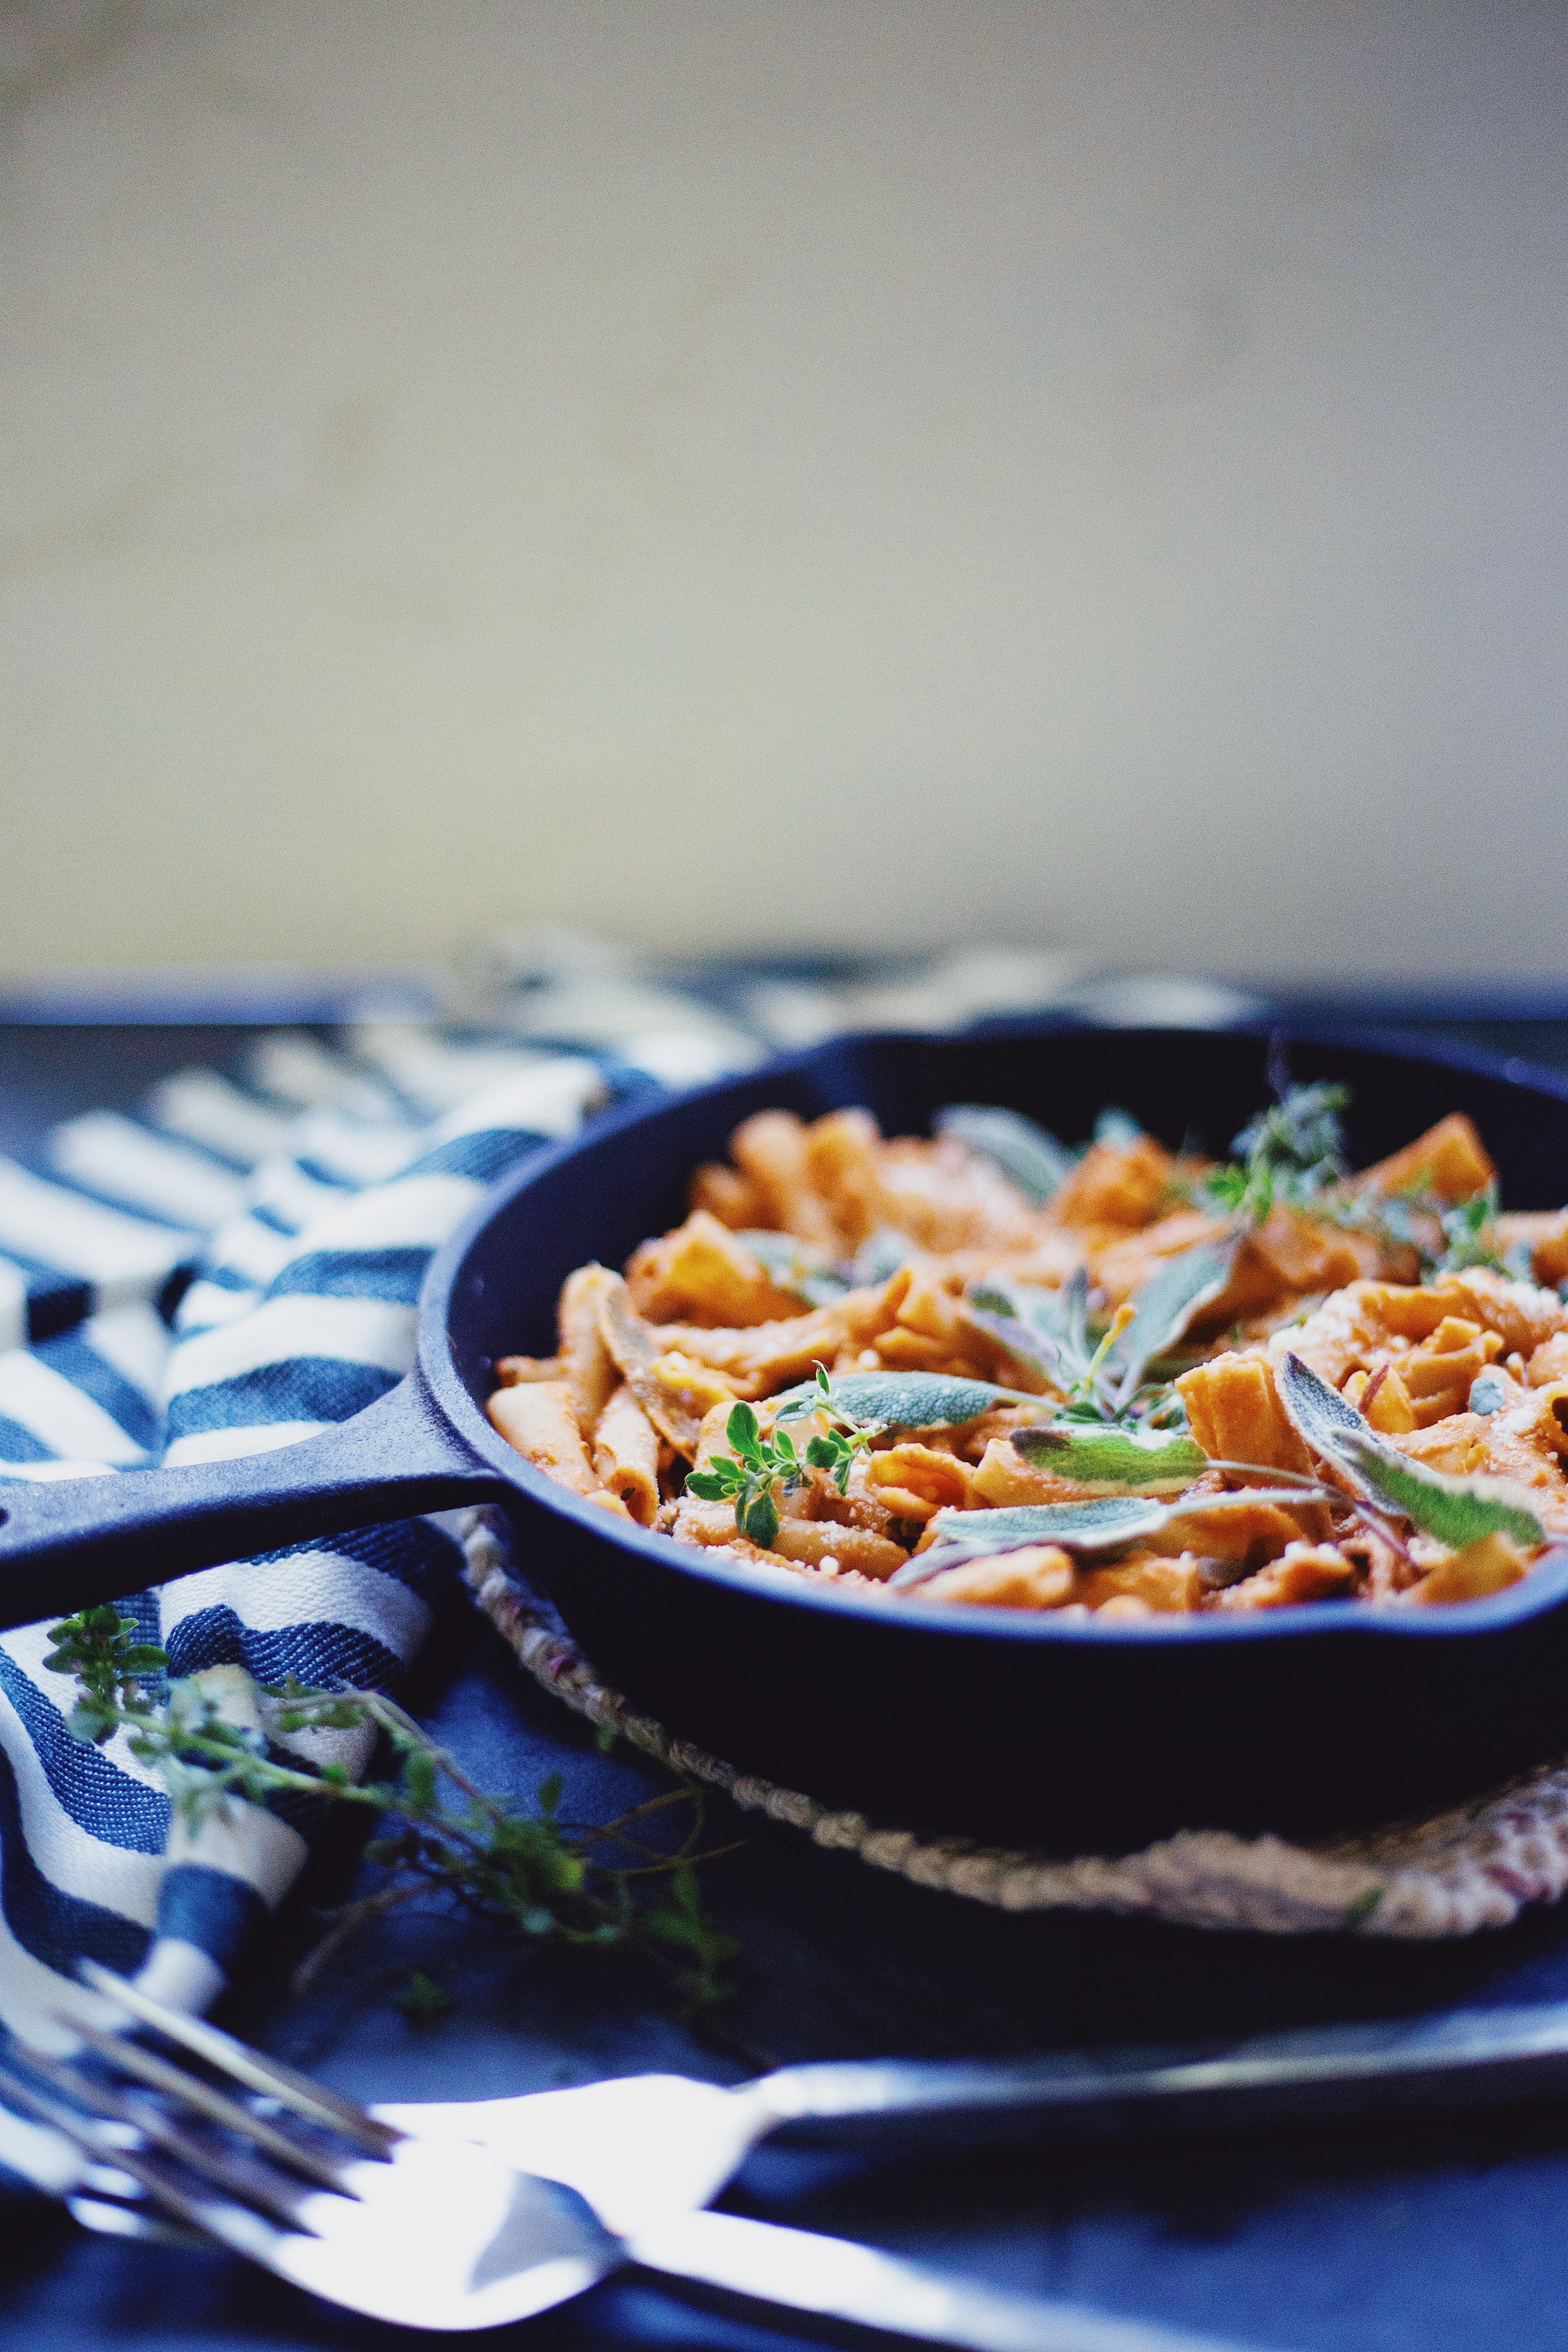 Gluten Free and vegan red pepper pasta